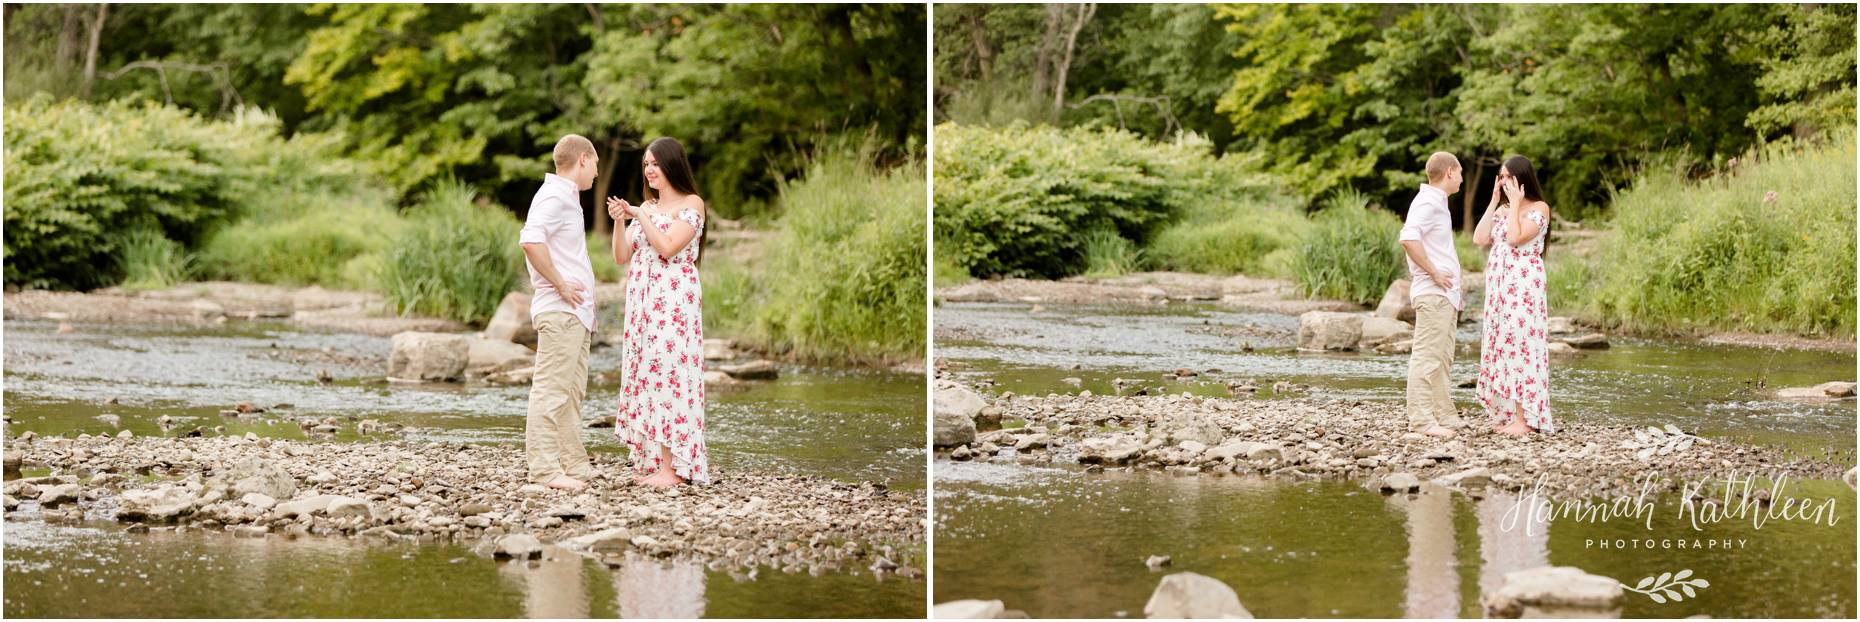 Buffalo_New_York_Proposal_Photographer